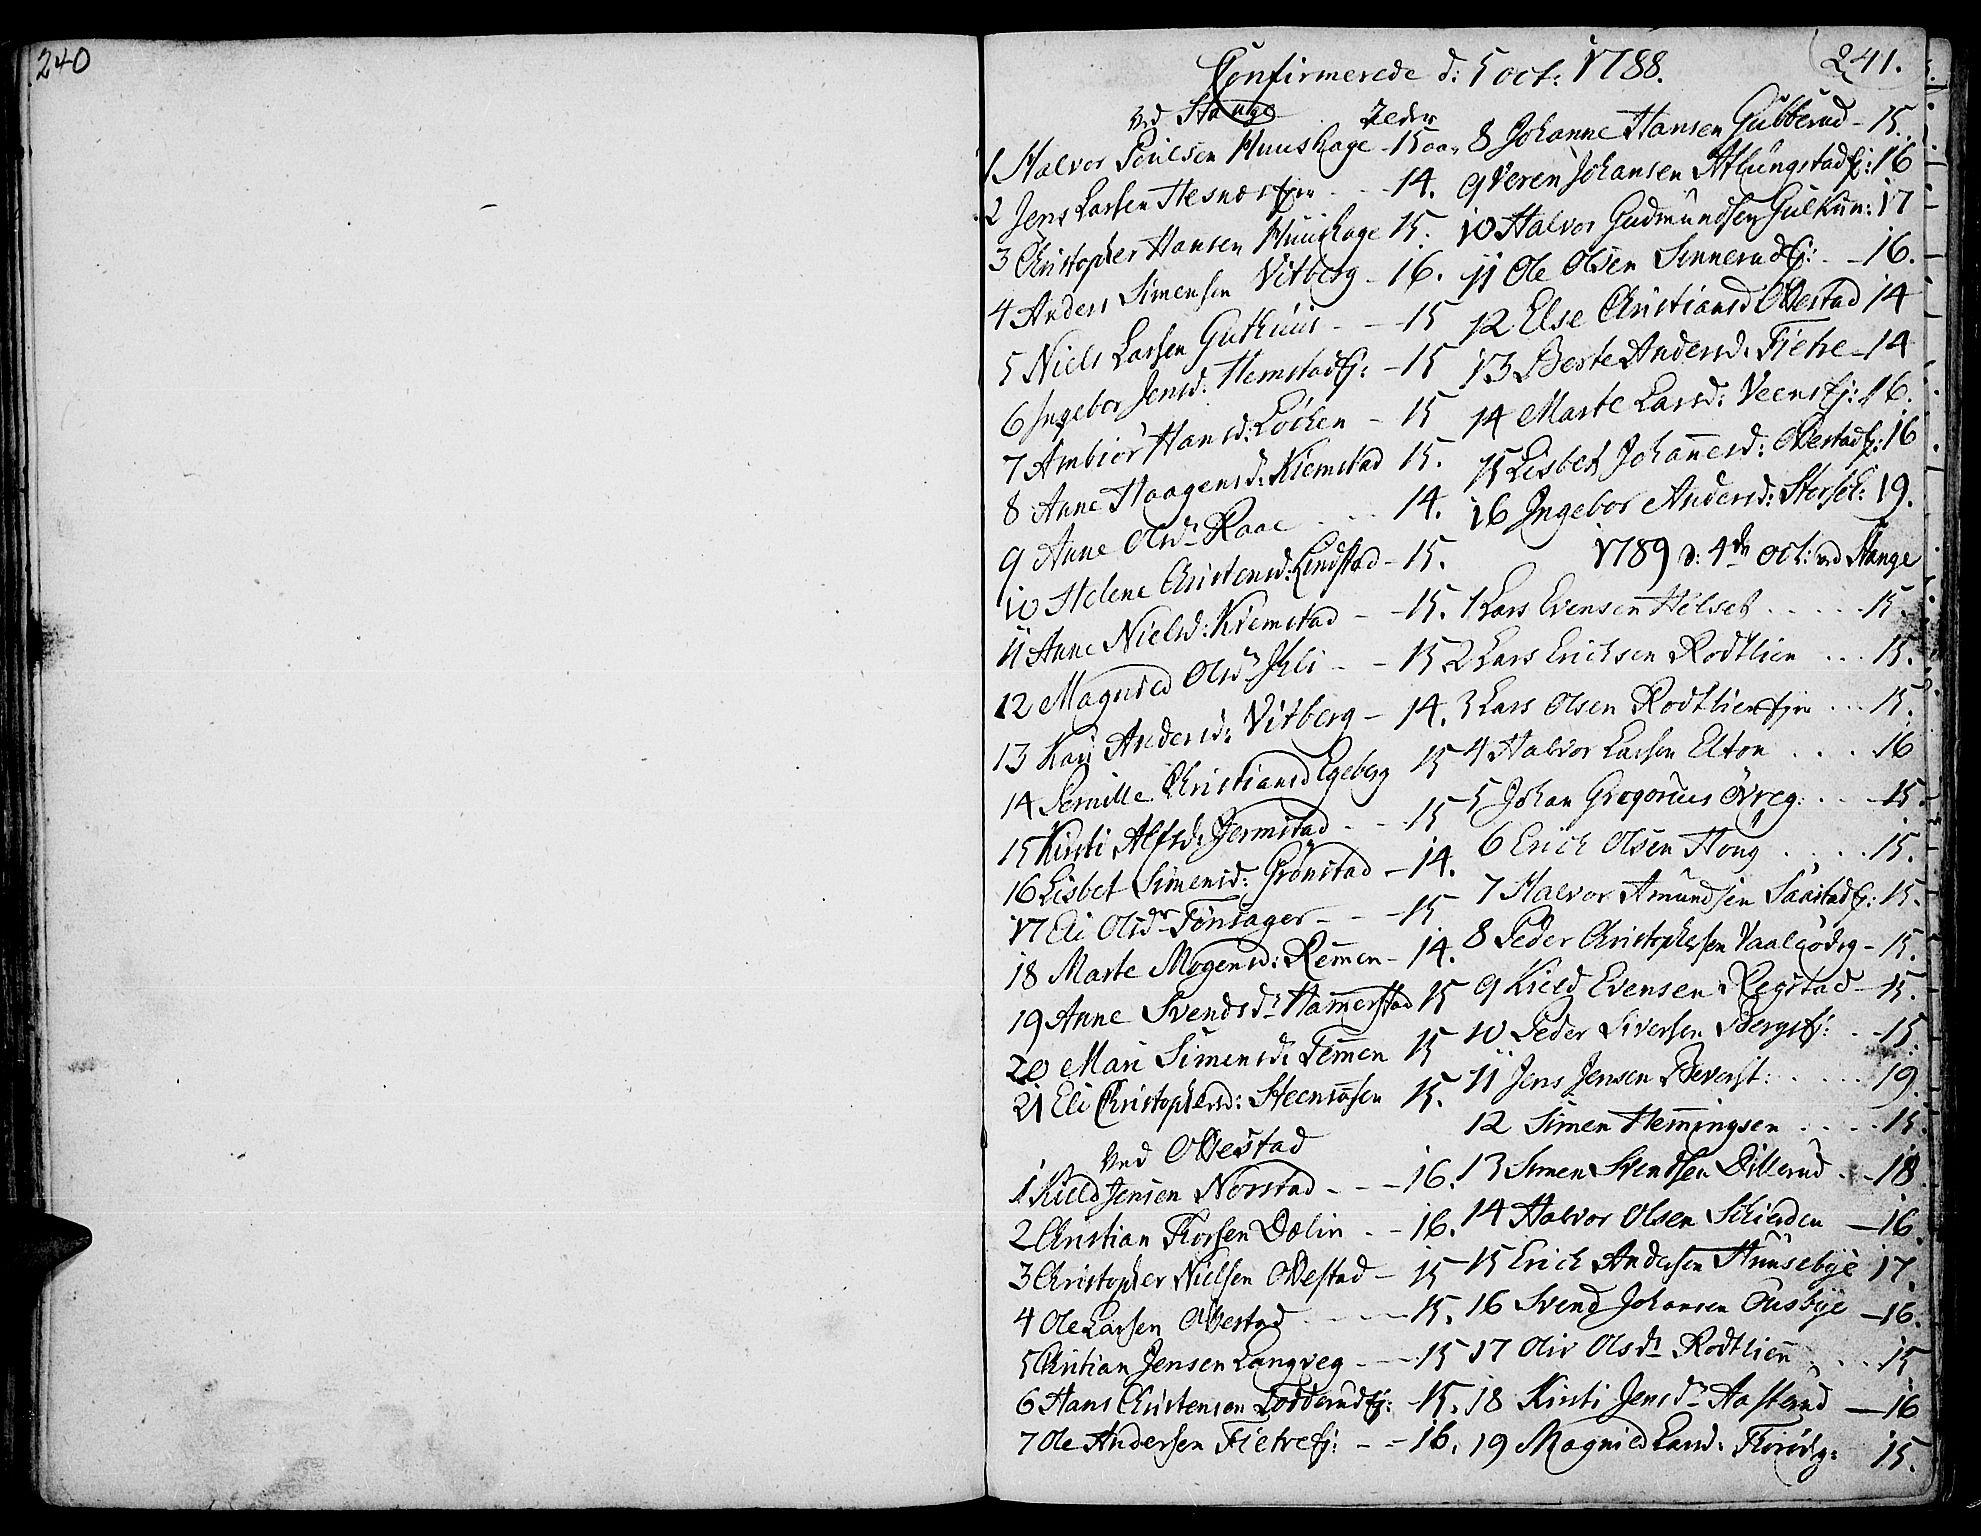 SAH, Stange prestekontor, K/L0007: Ministerialbok nr. 7, 1788-1813, s. 240-241